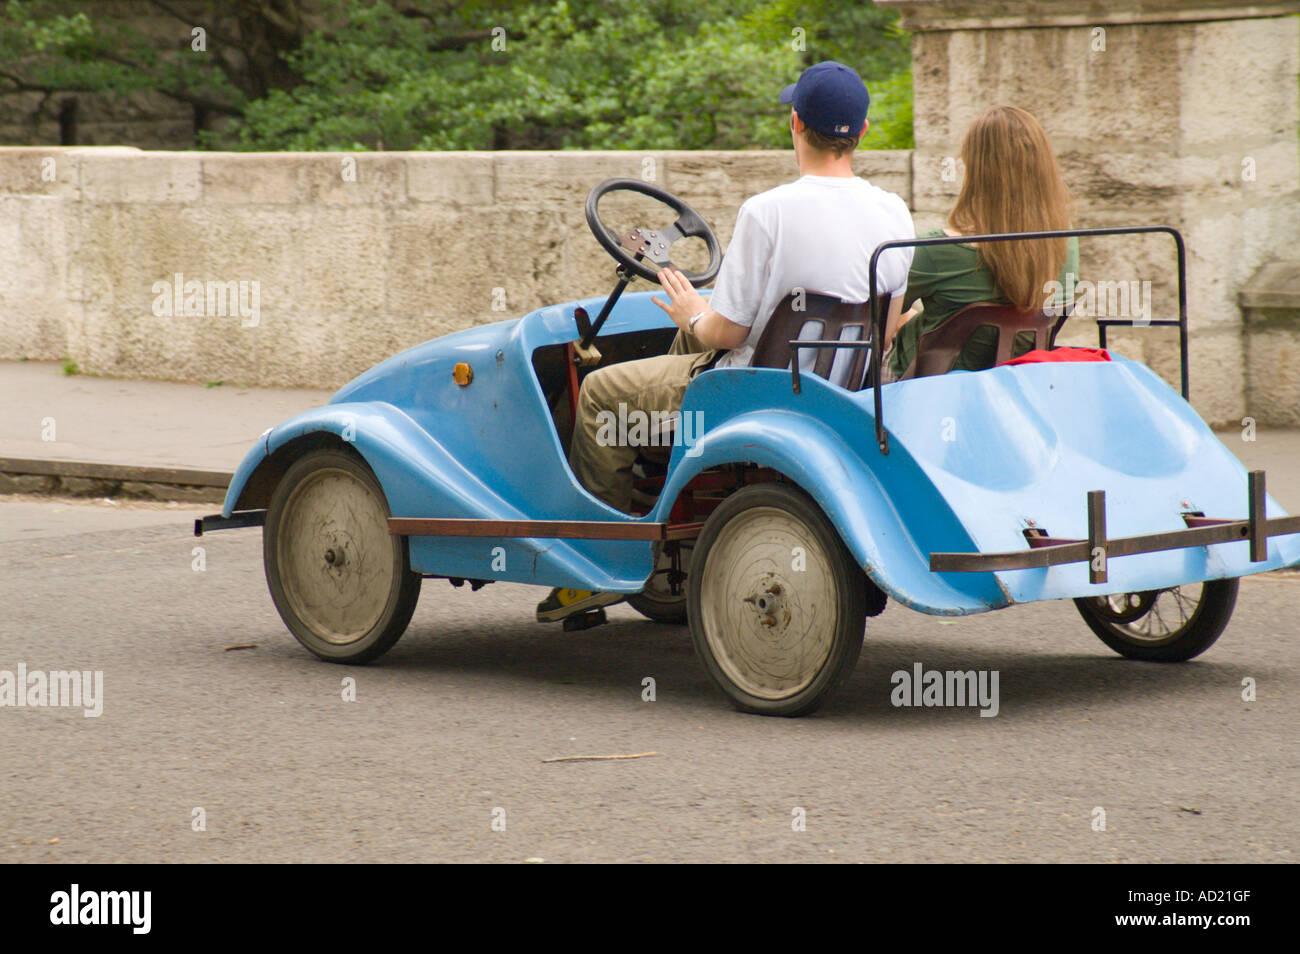 Pedal Car For Grown Ups For Hire In Budapest S Varosliget City Park